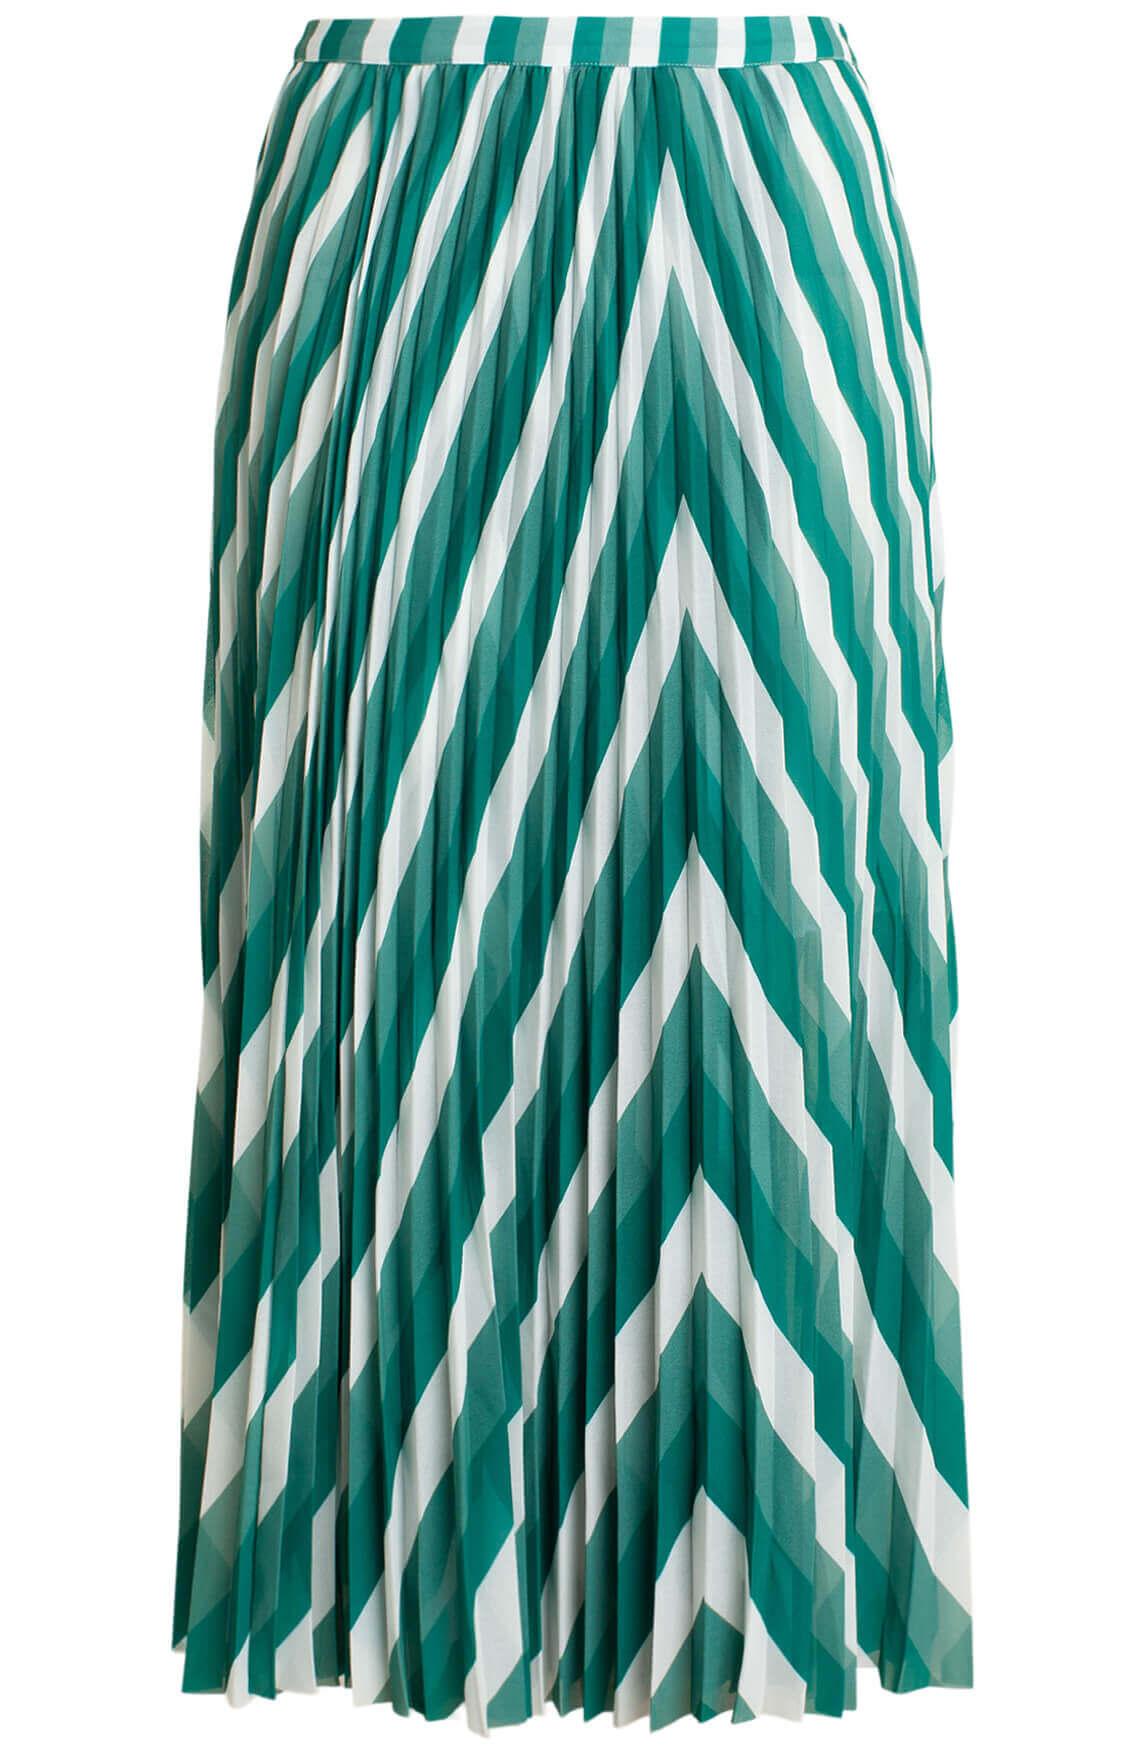 Samsoe Samsoe Dames Cocos plissé rok groen